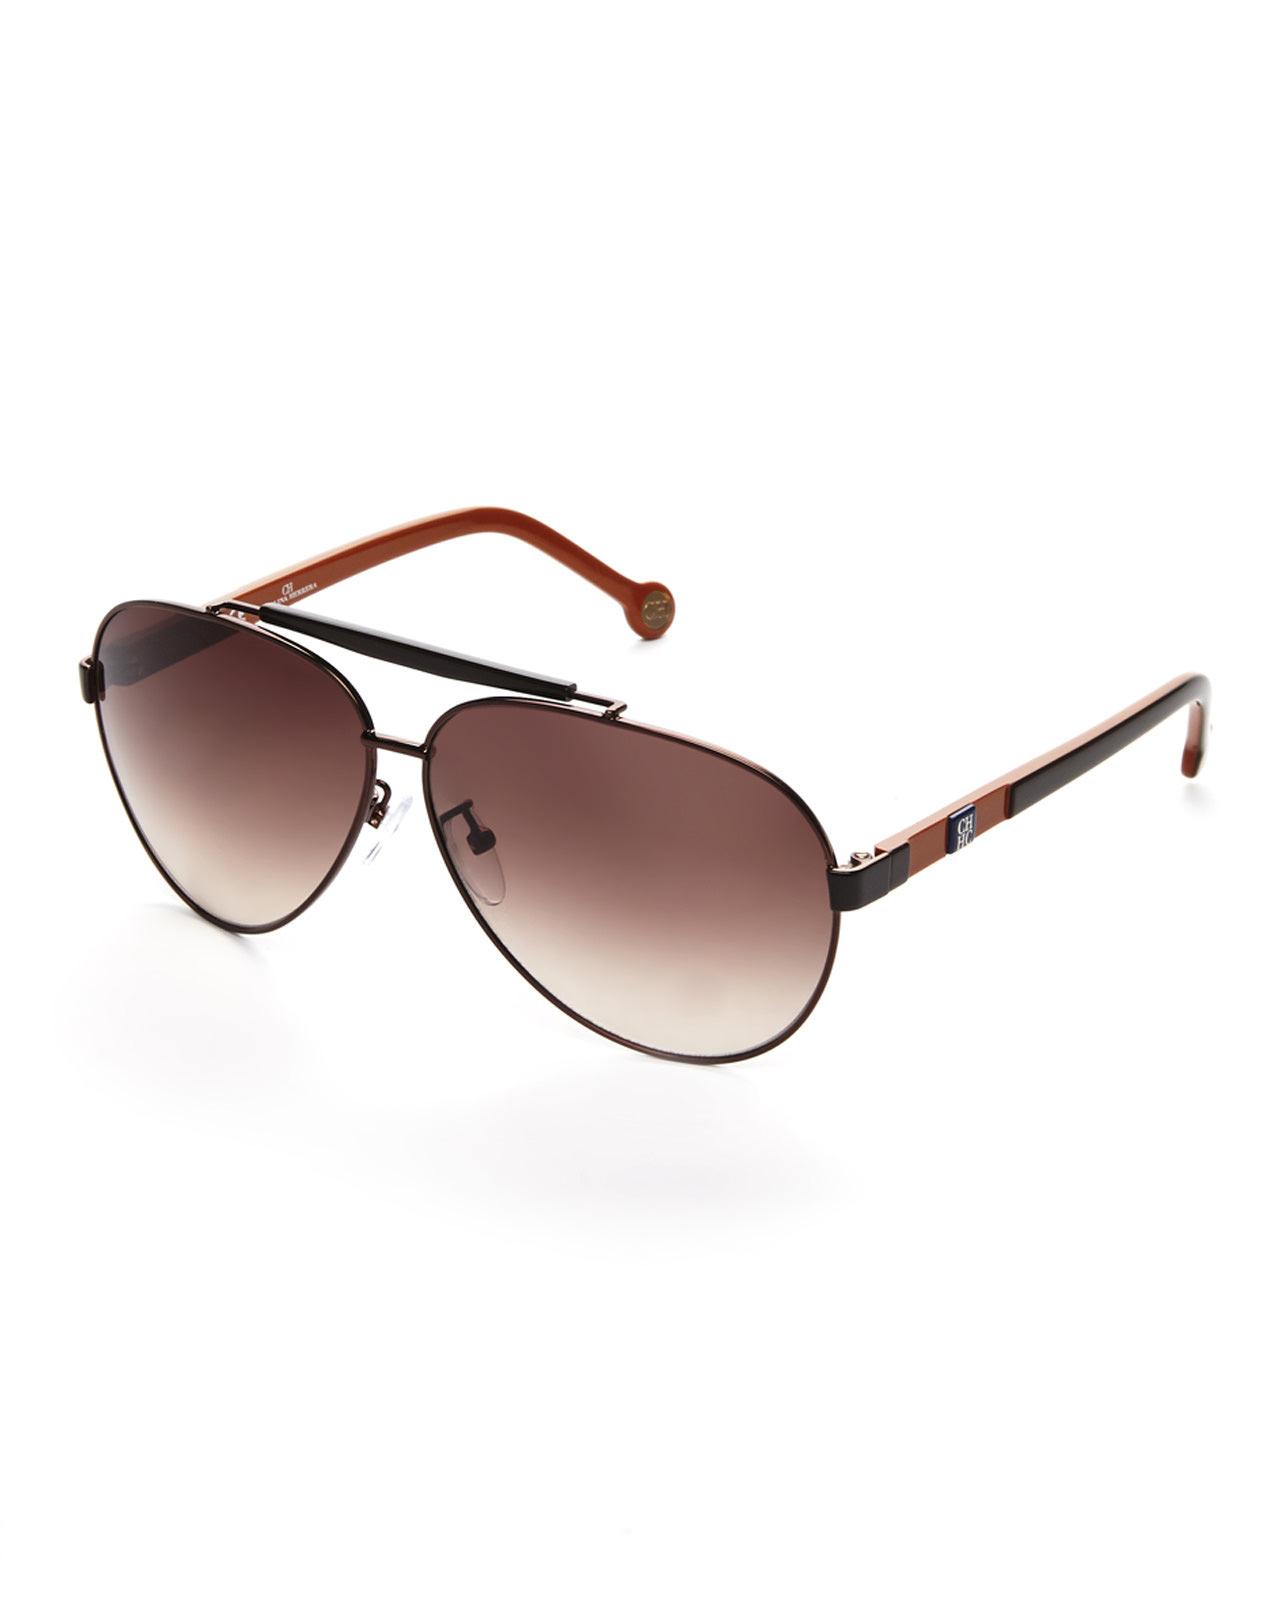 989508c292 Lyst - Carolina Herrera Brown   Orange She031 Aviator Sunglasses in ...